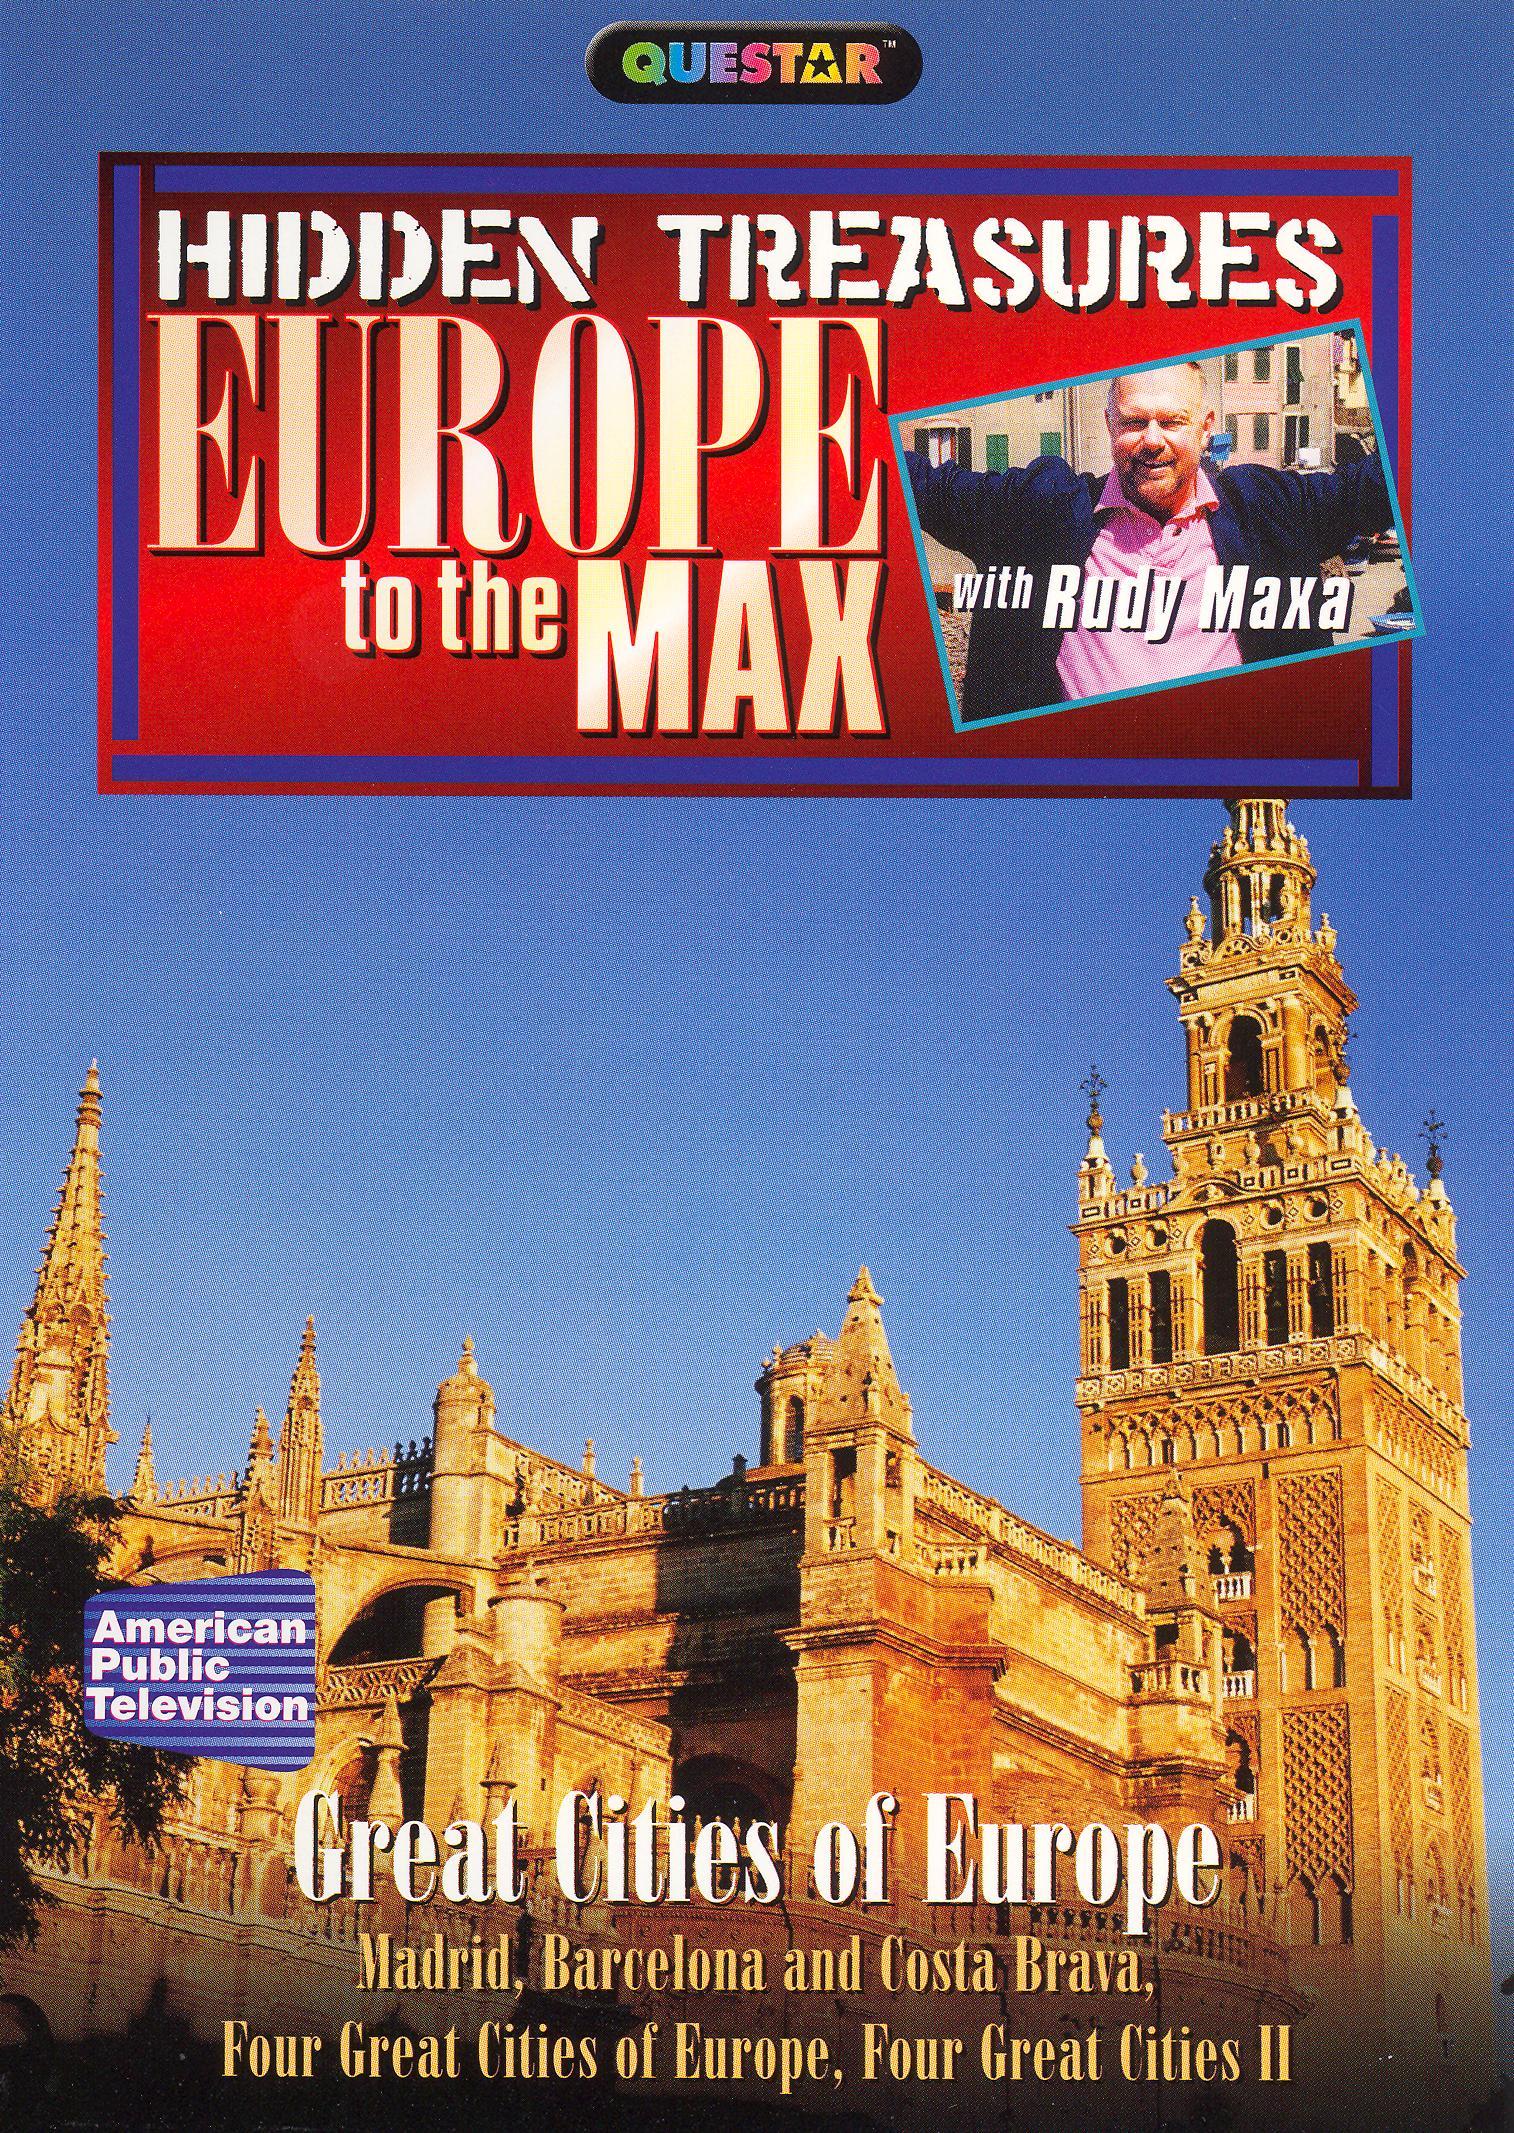 Rudy Maxa: Europe to the Max: Hidden Treasures - Great Cities of Europe